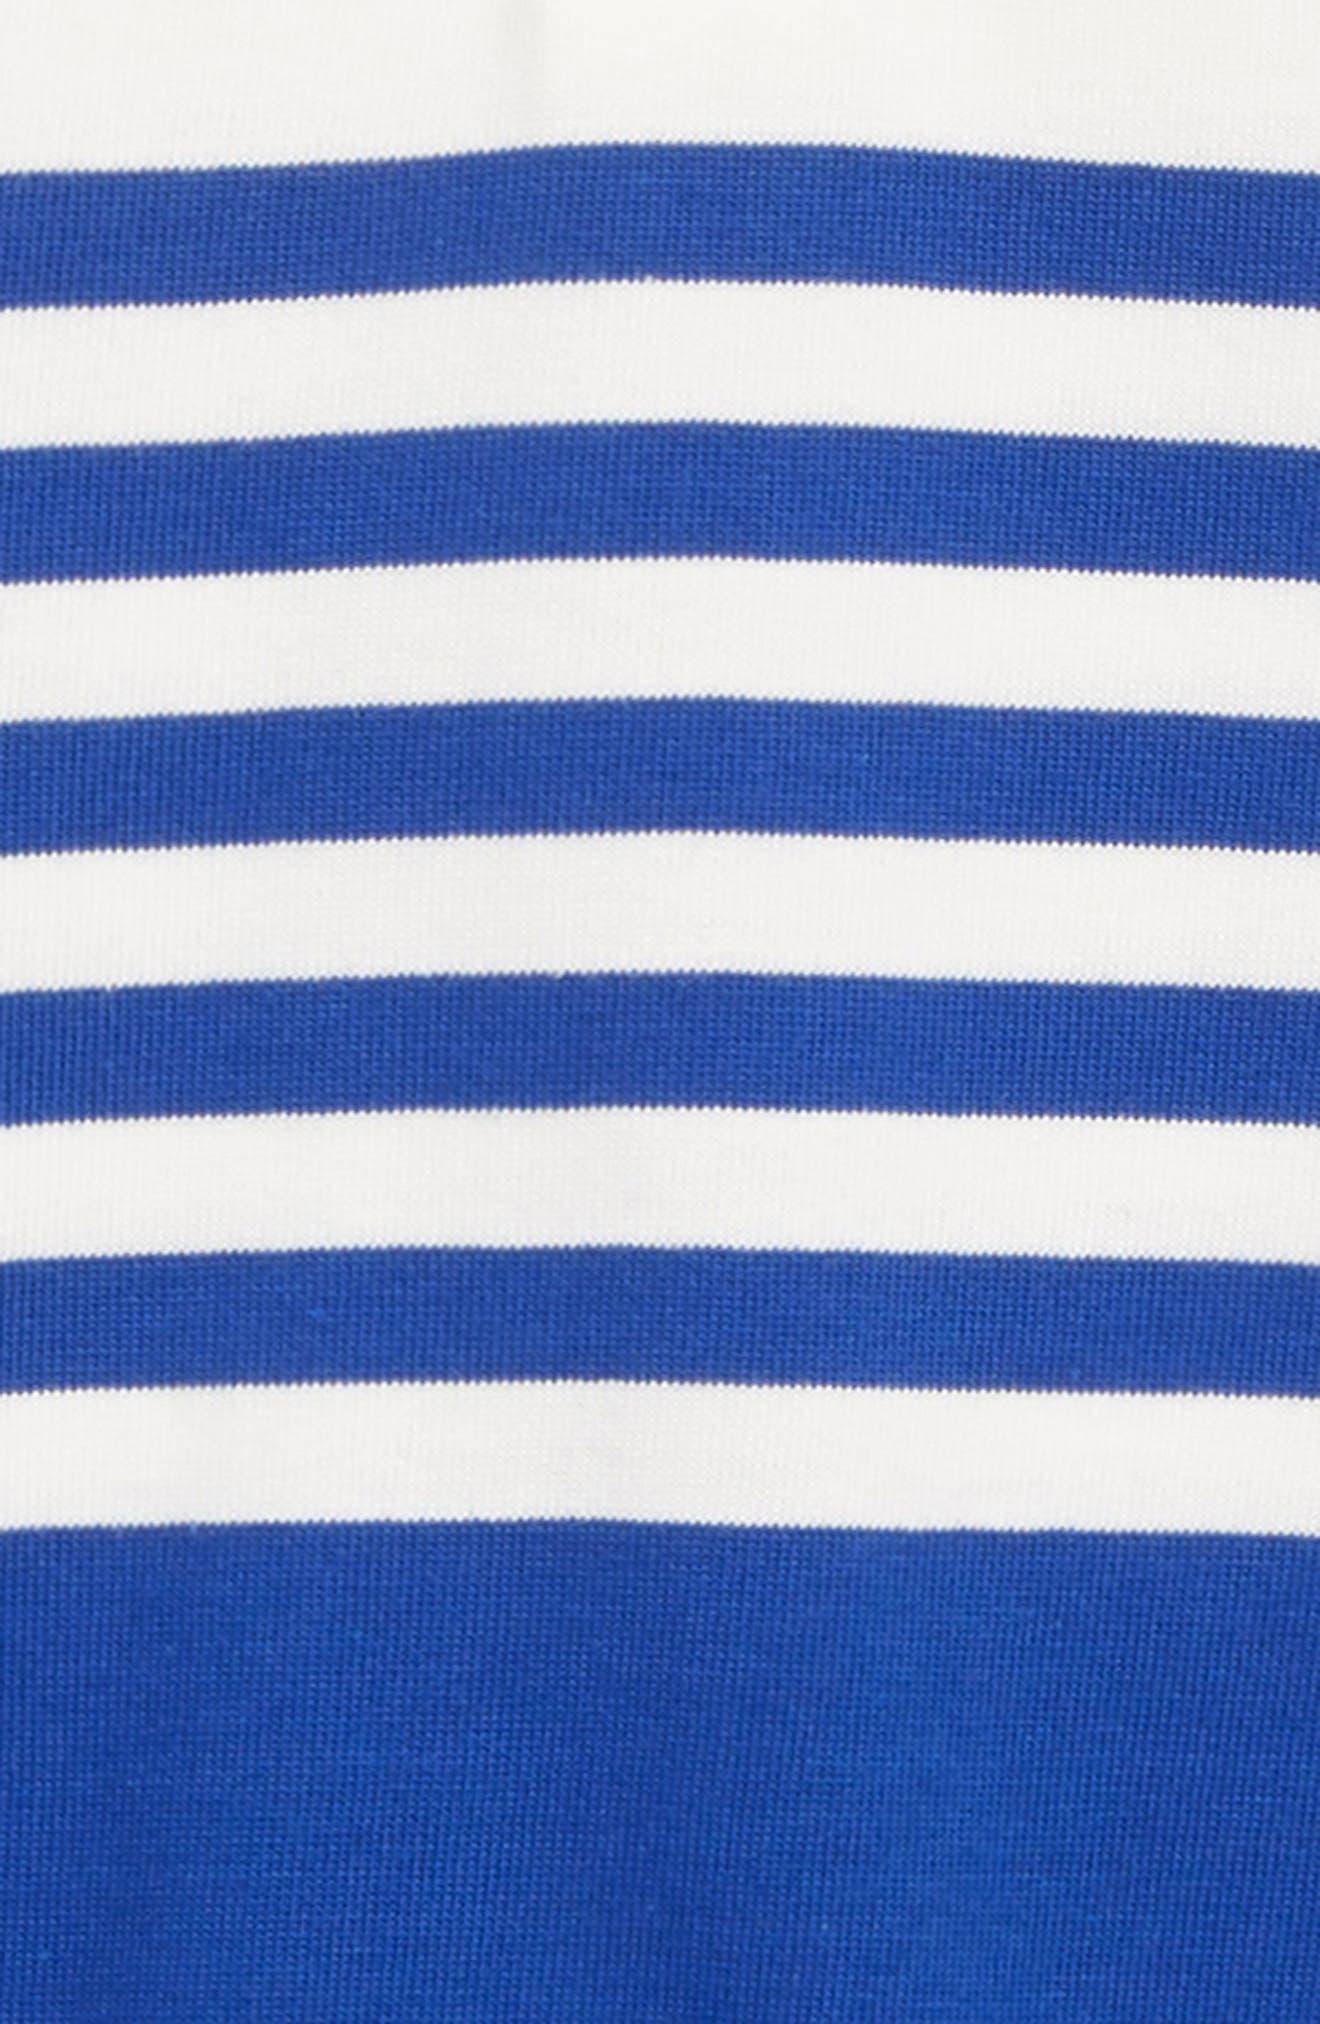 Cotton Polo Romper,                             Alternate thumbnail 2, color,                             MILK/ ELECTRIC BLUE